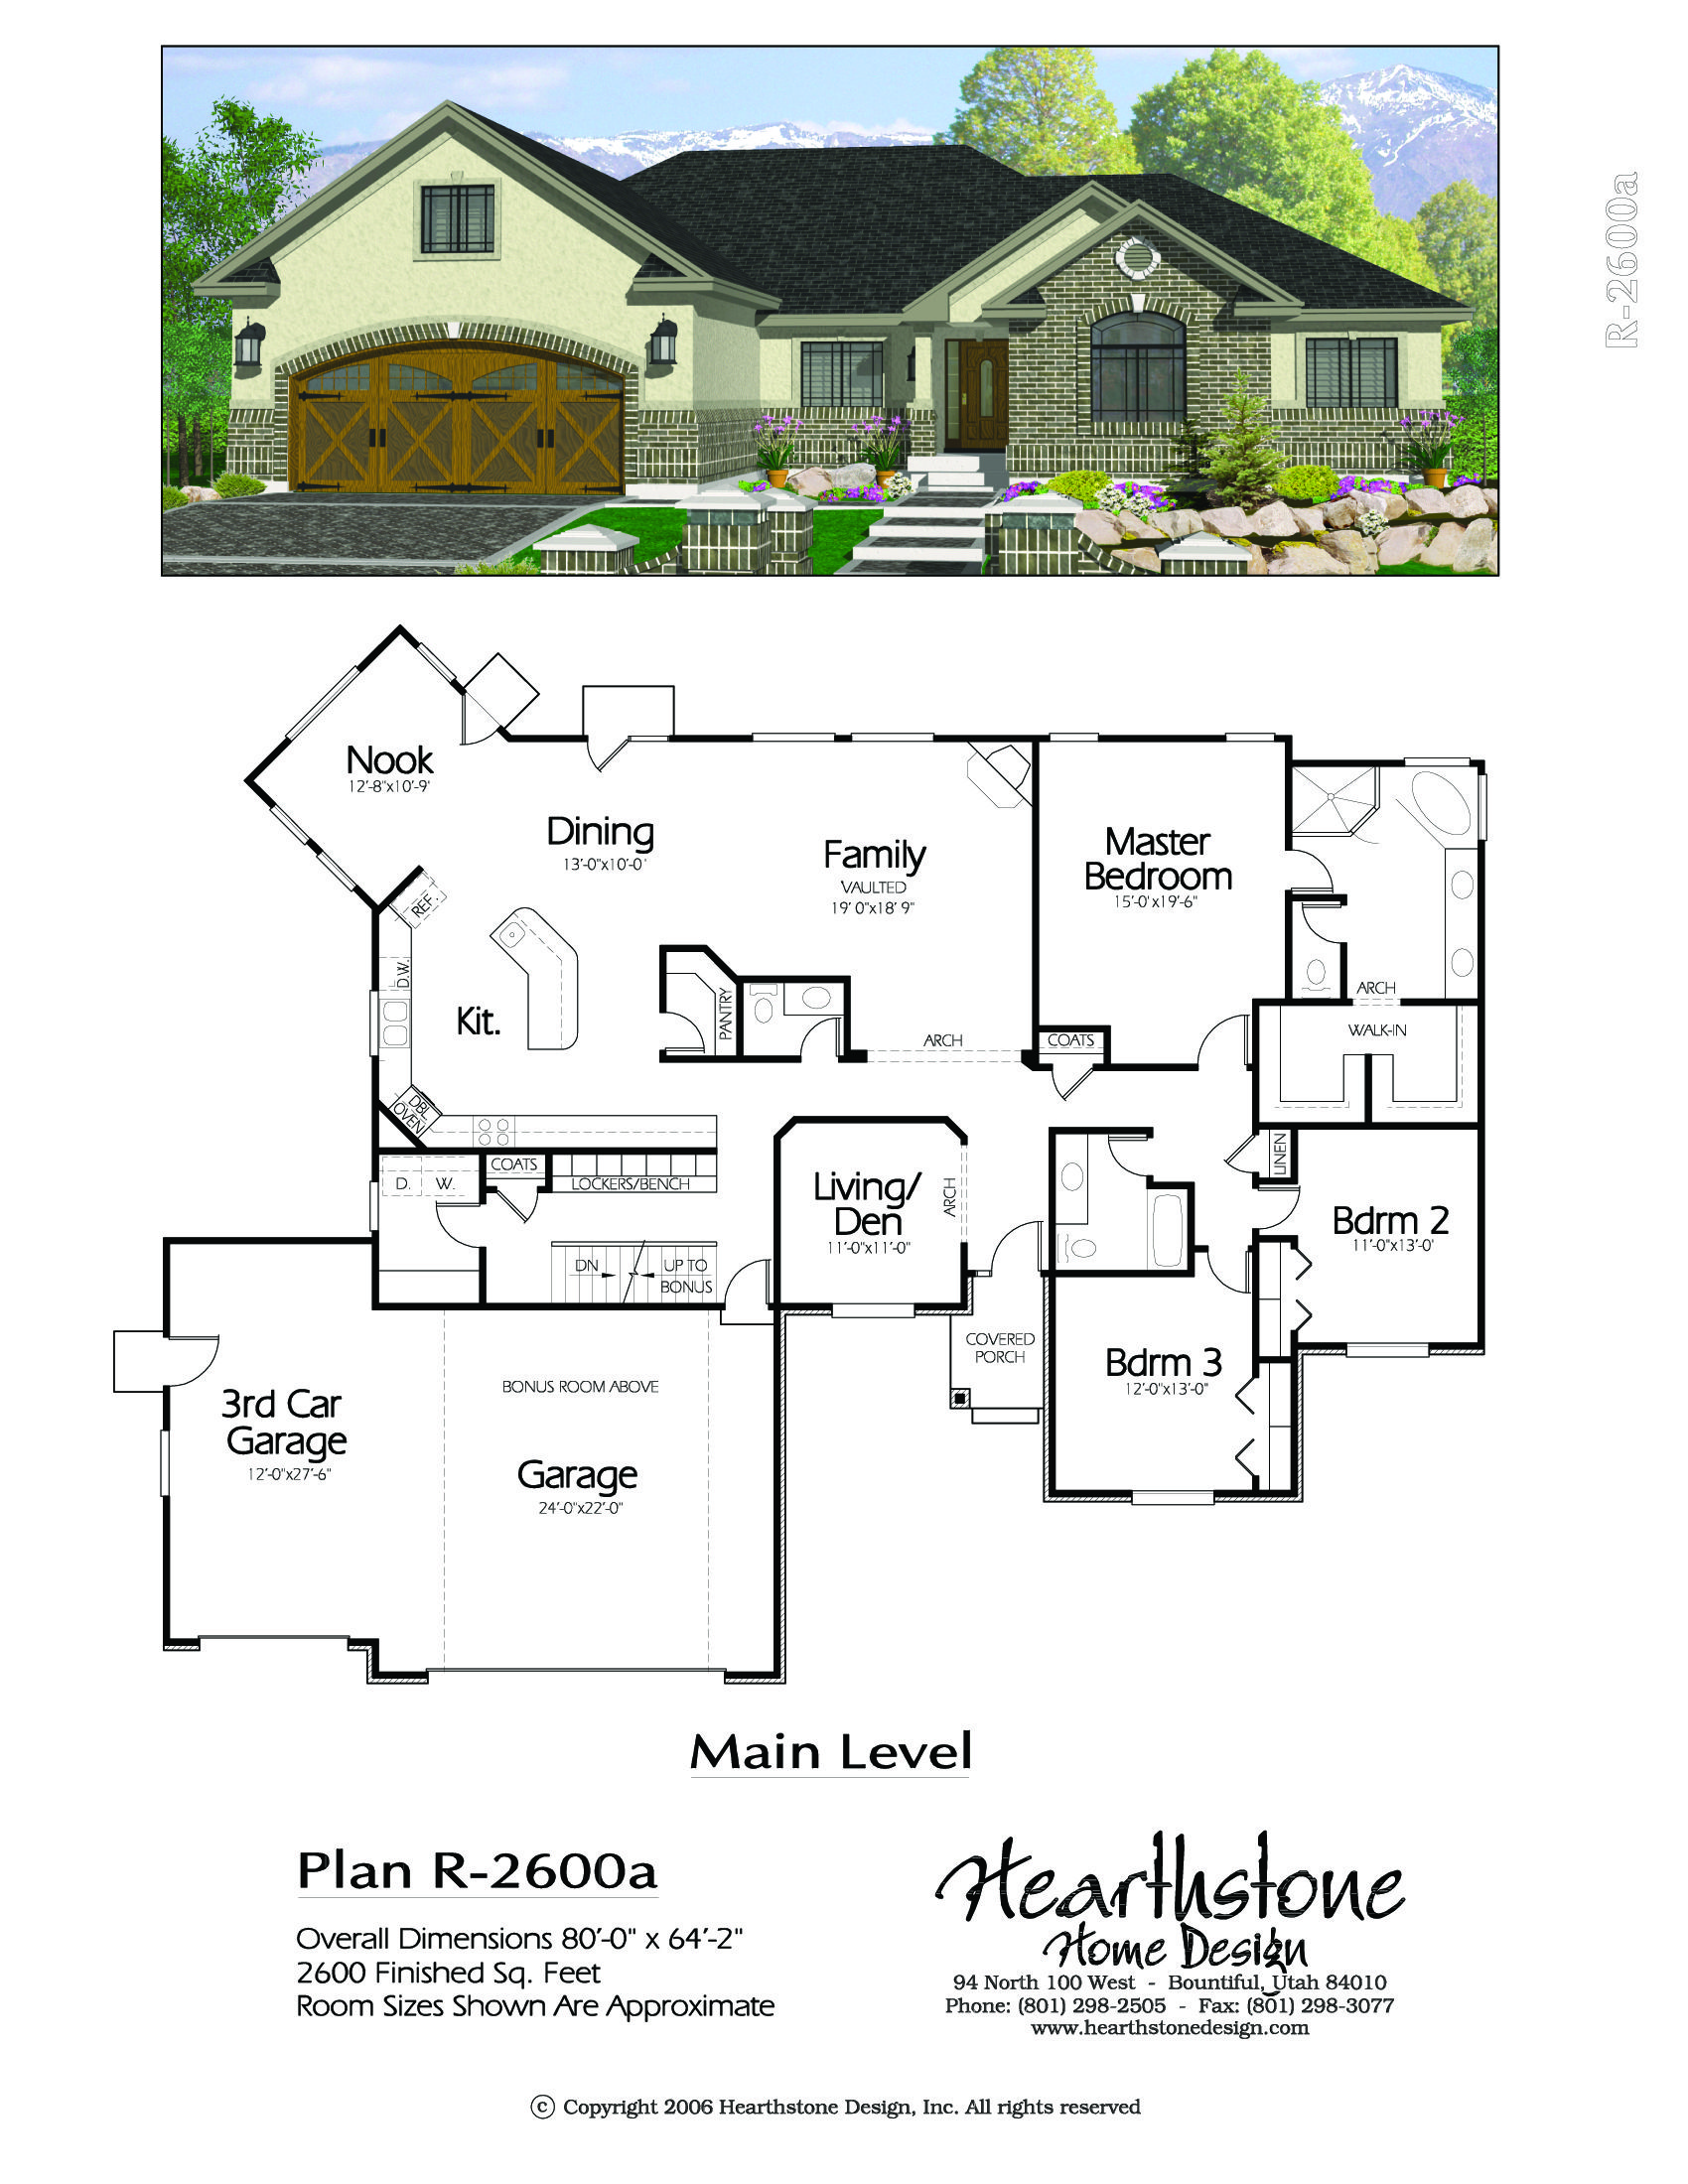 R 2600a Hearthstone Home Design Craftsman House Plans House Plans Farmhouse Country House Plans